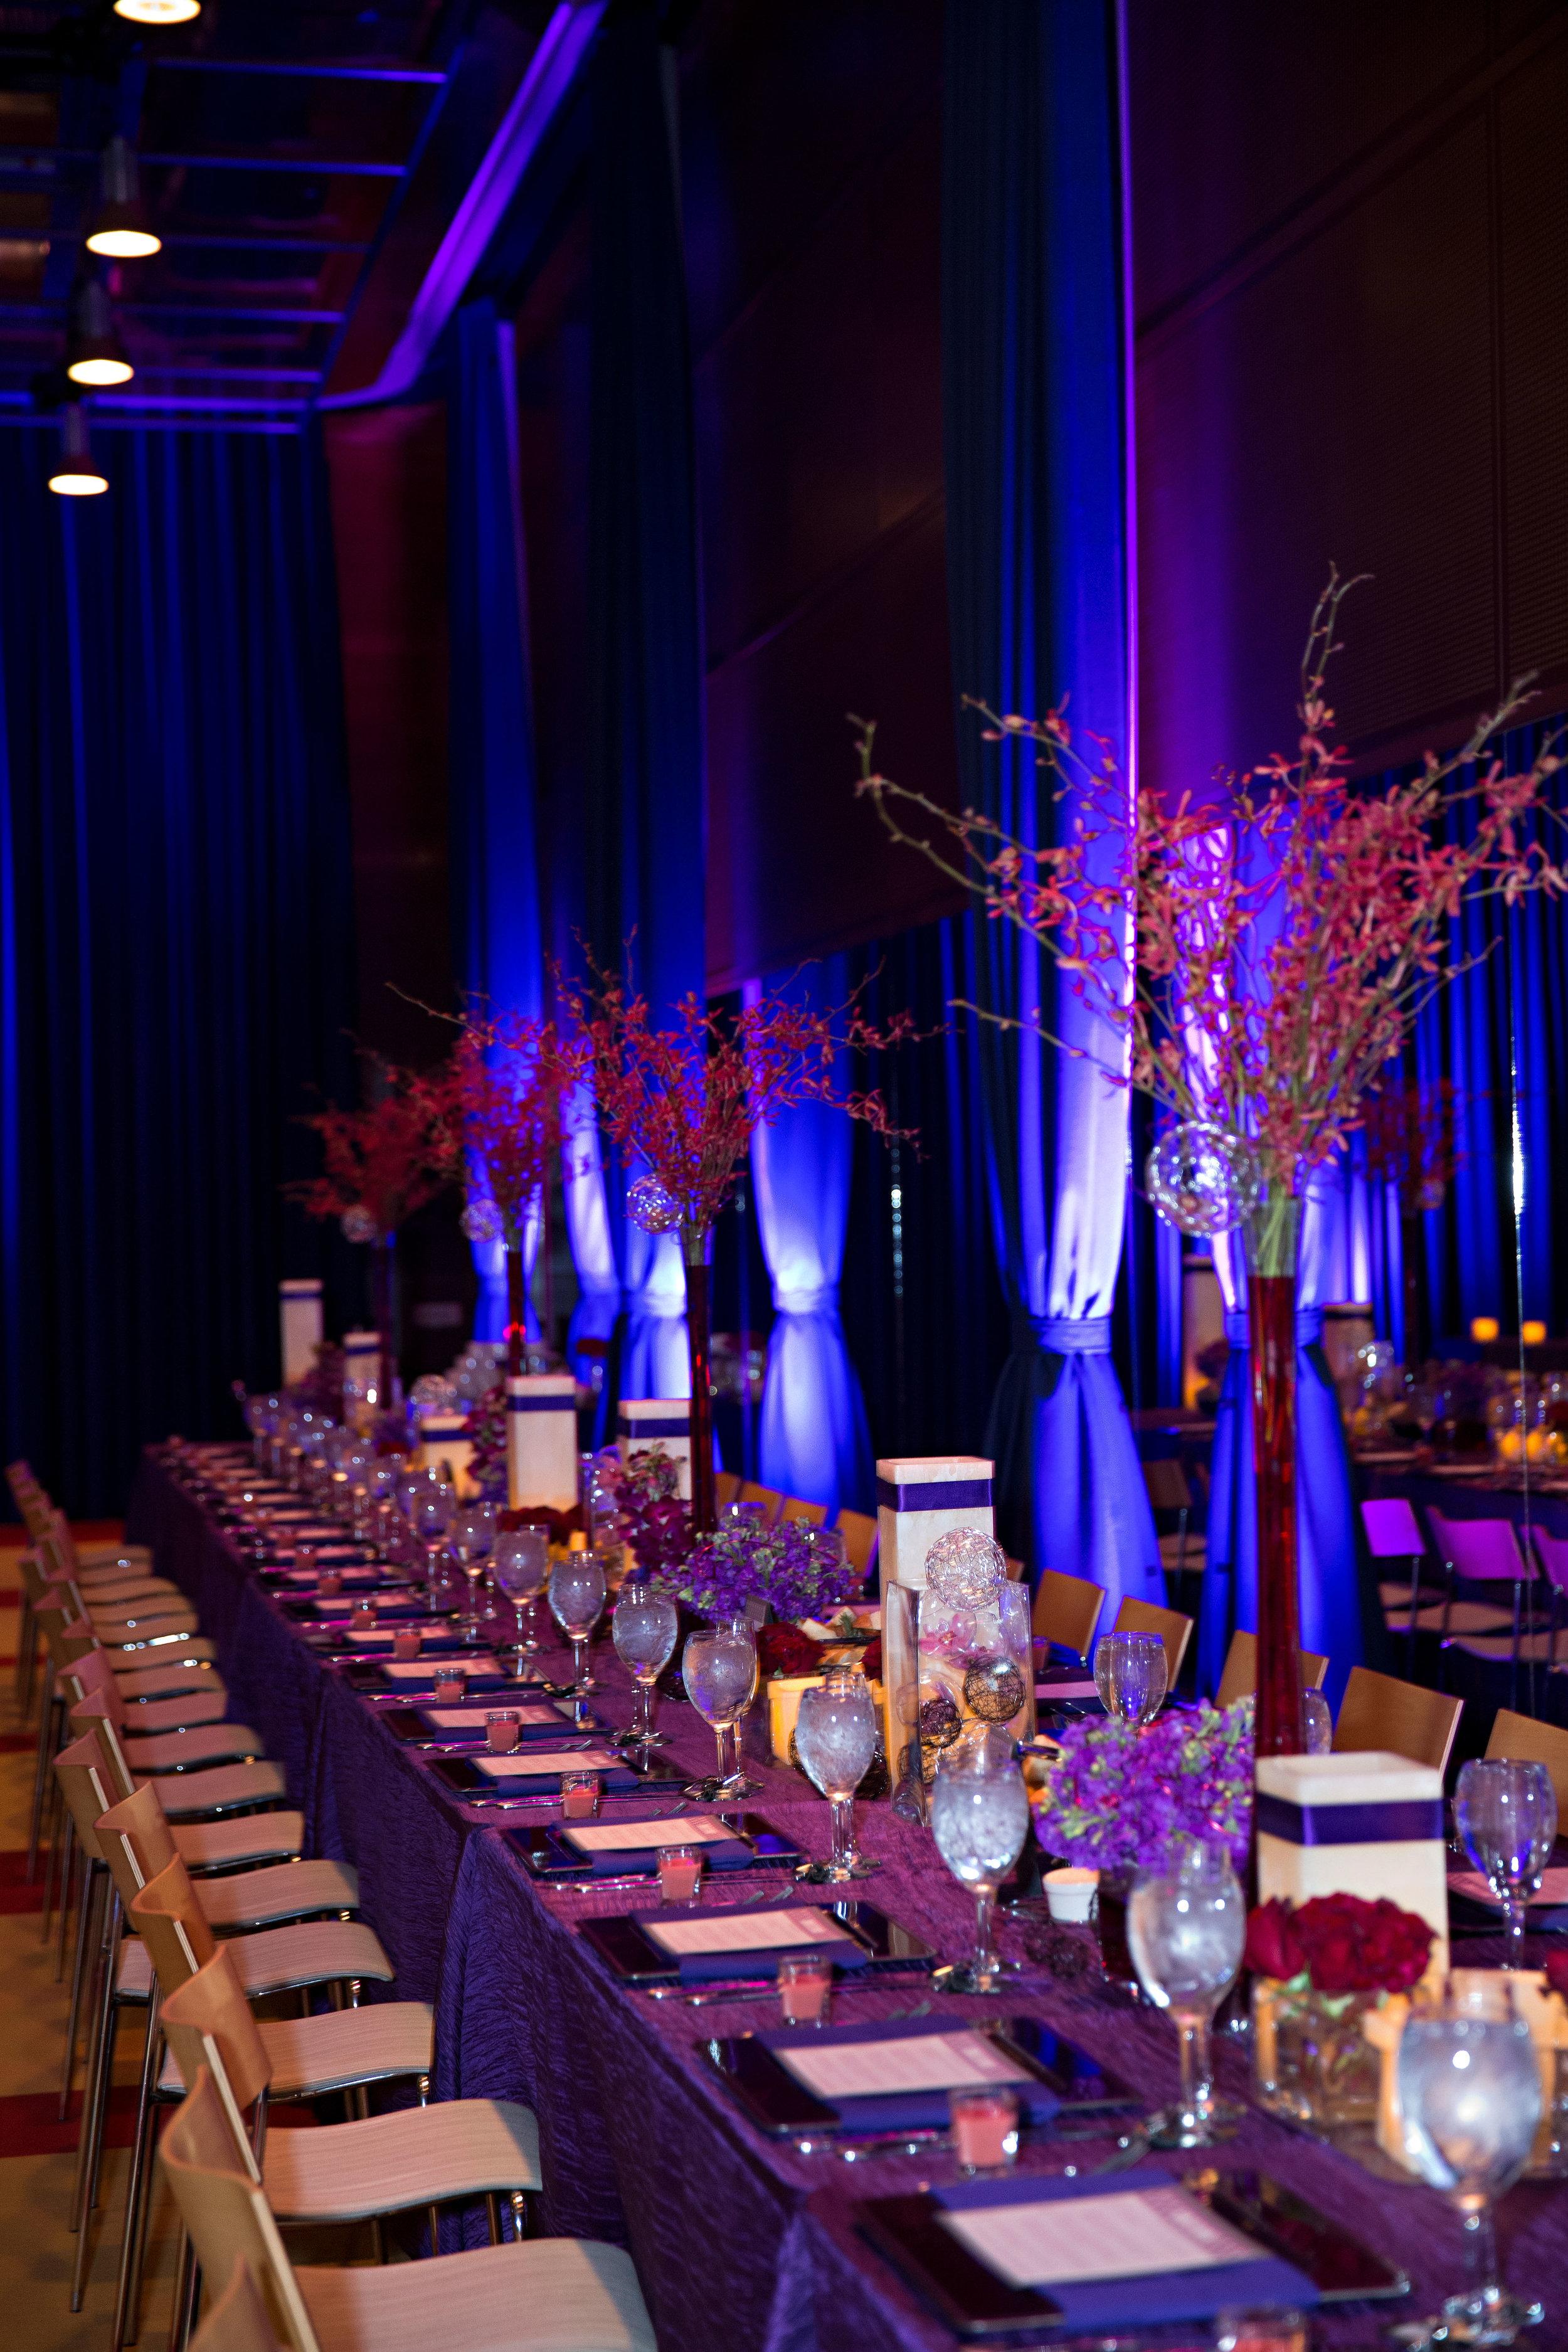 19 unique wedding reception large wedding reception hall purple reception all purple wedding decor O Grace Photography Life Design Events.jpg